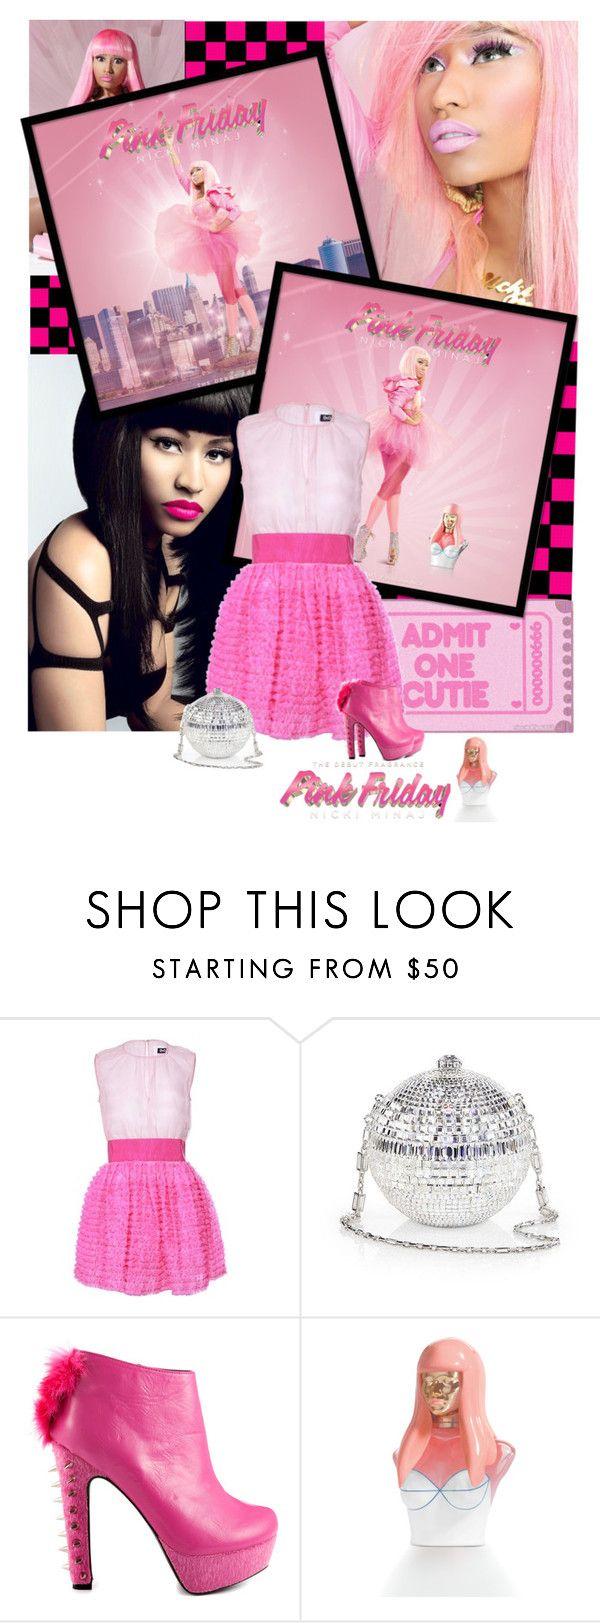 pink friday nicki minaj by kendraborneman liked on polyvore featuring